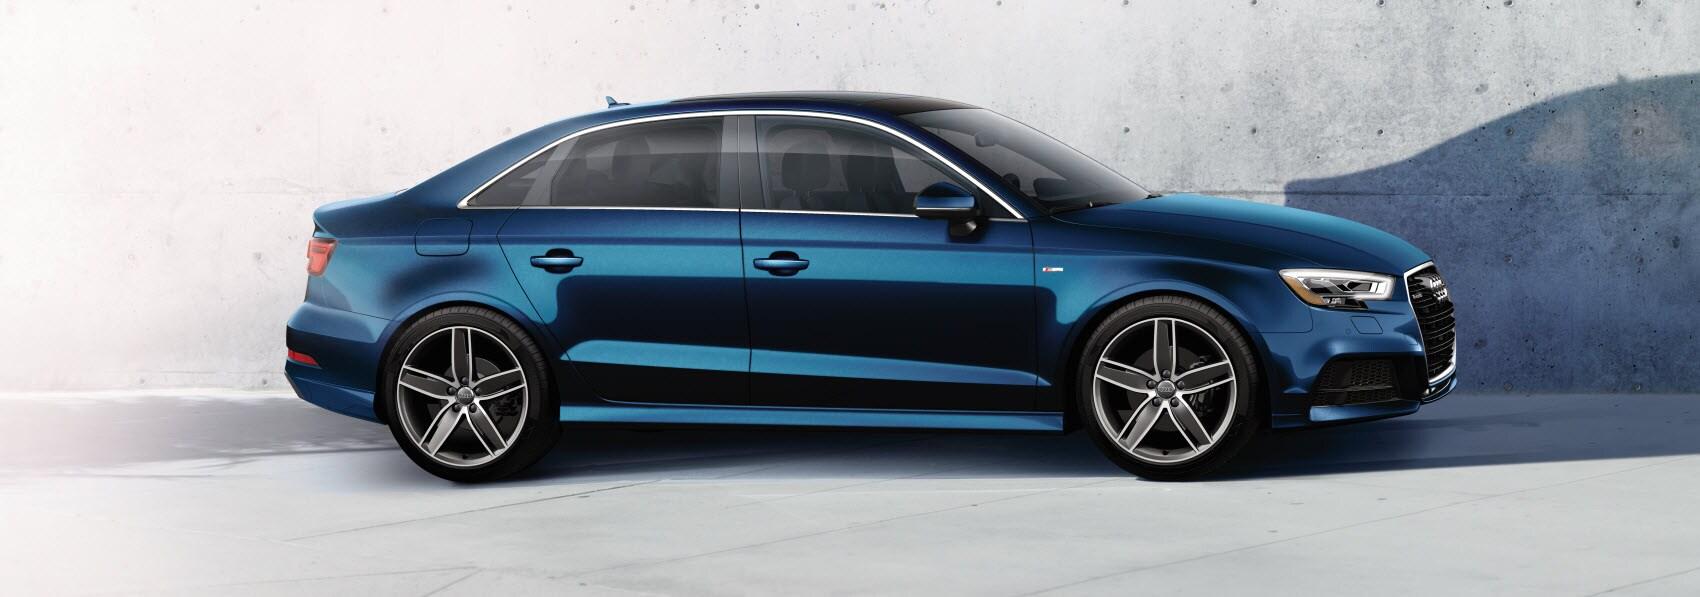 Audi Comparisons Fort Worth TX Audi Fort Worth - Fort worth audi